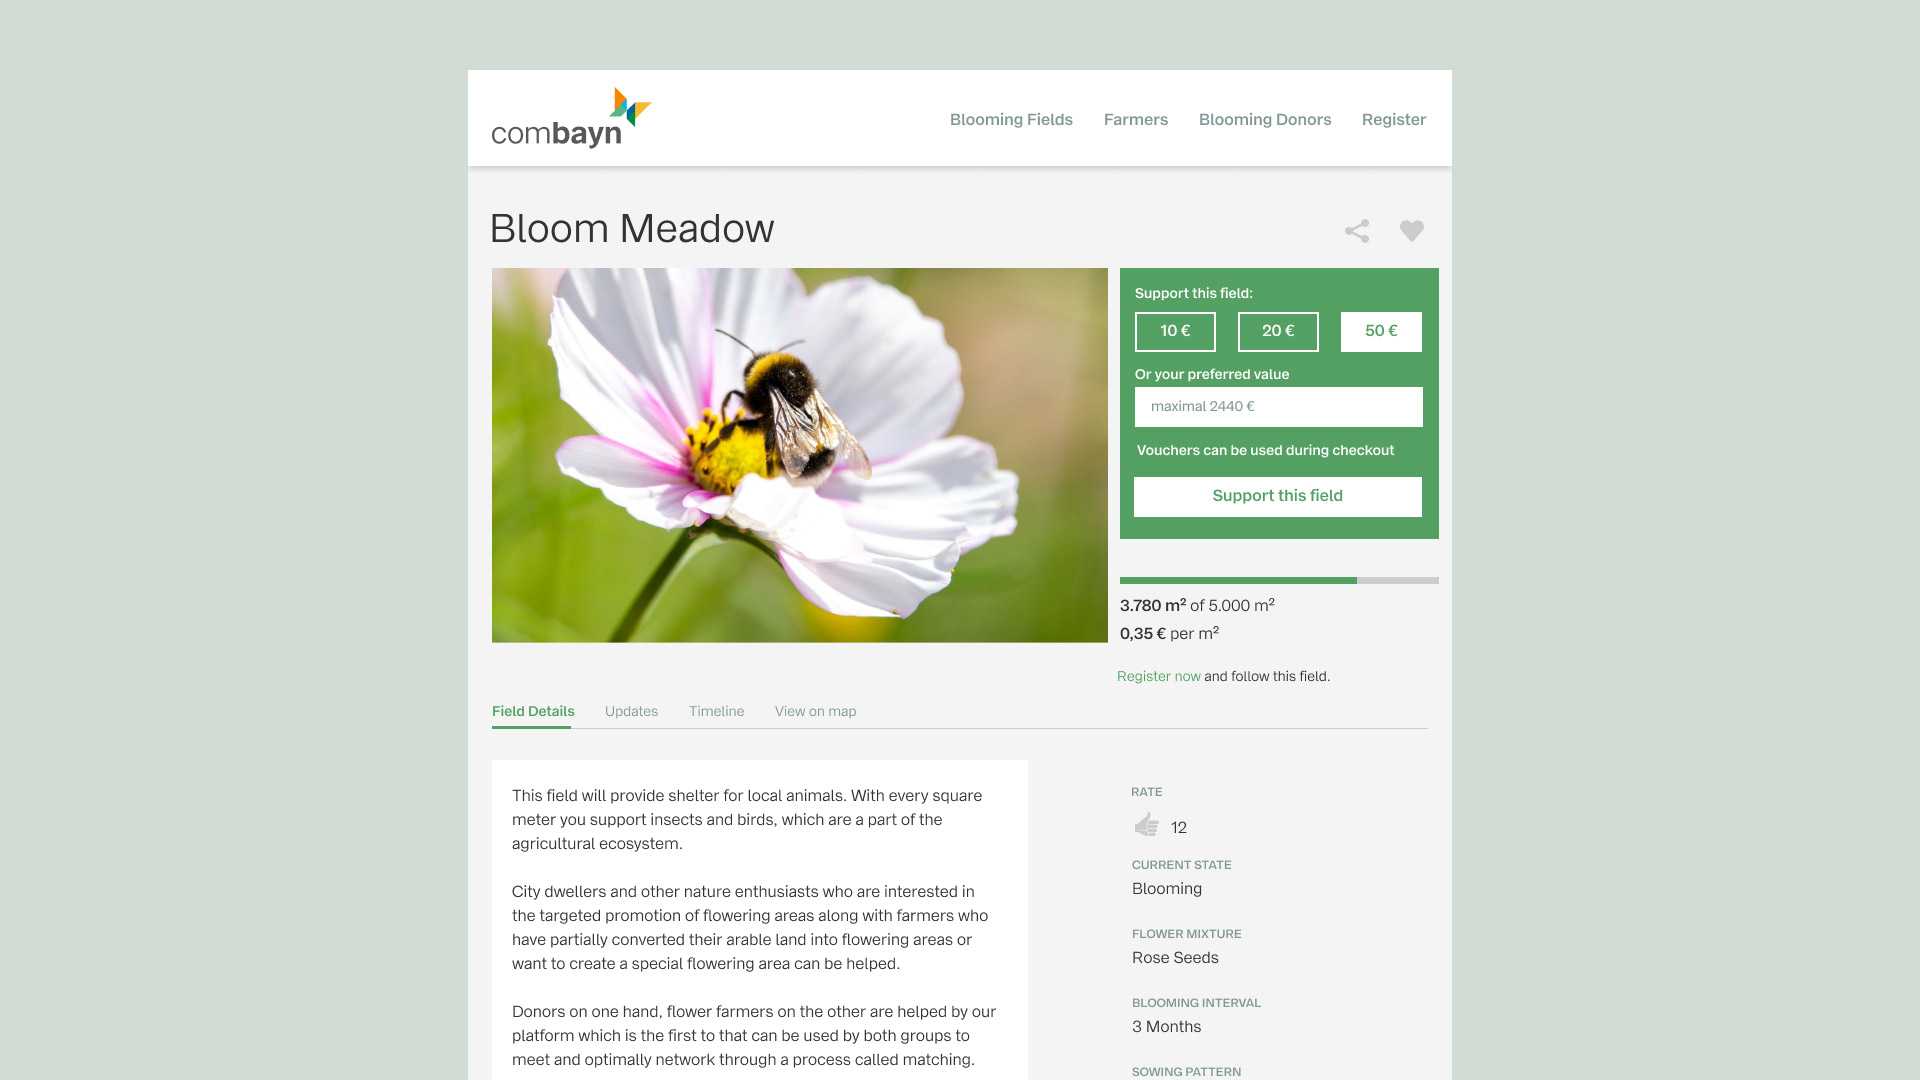 Combayn-Flower-Field-Design-Donation